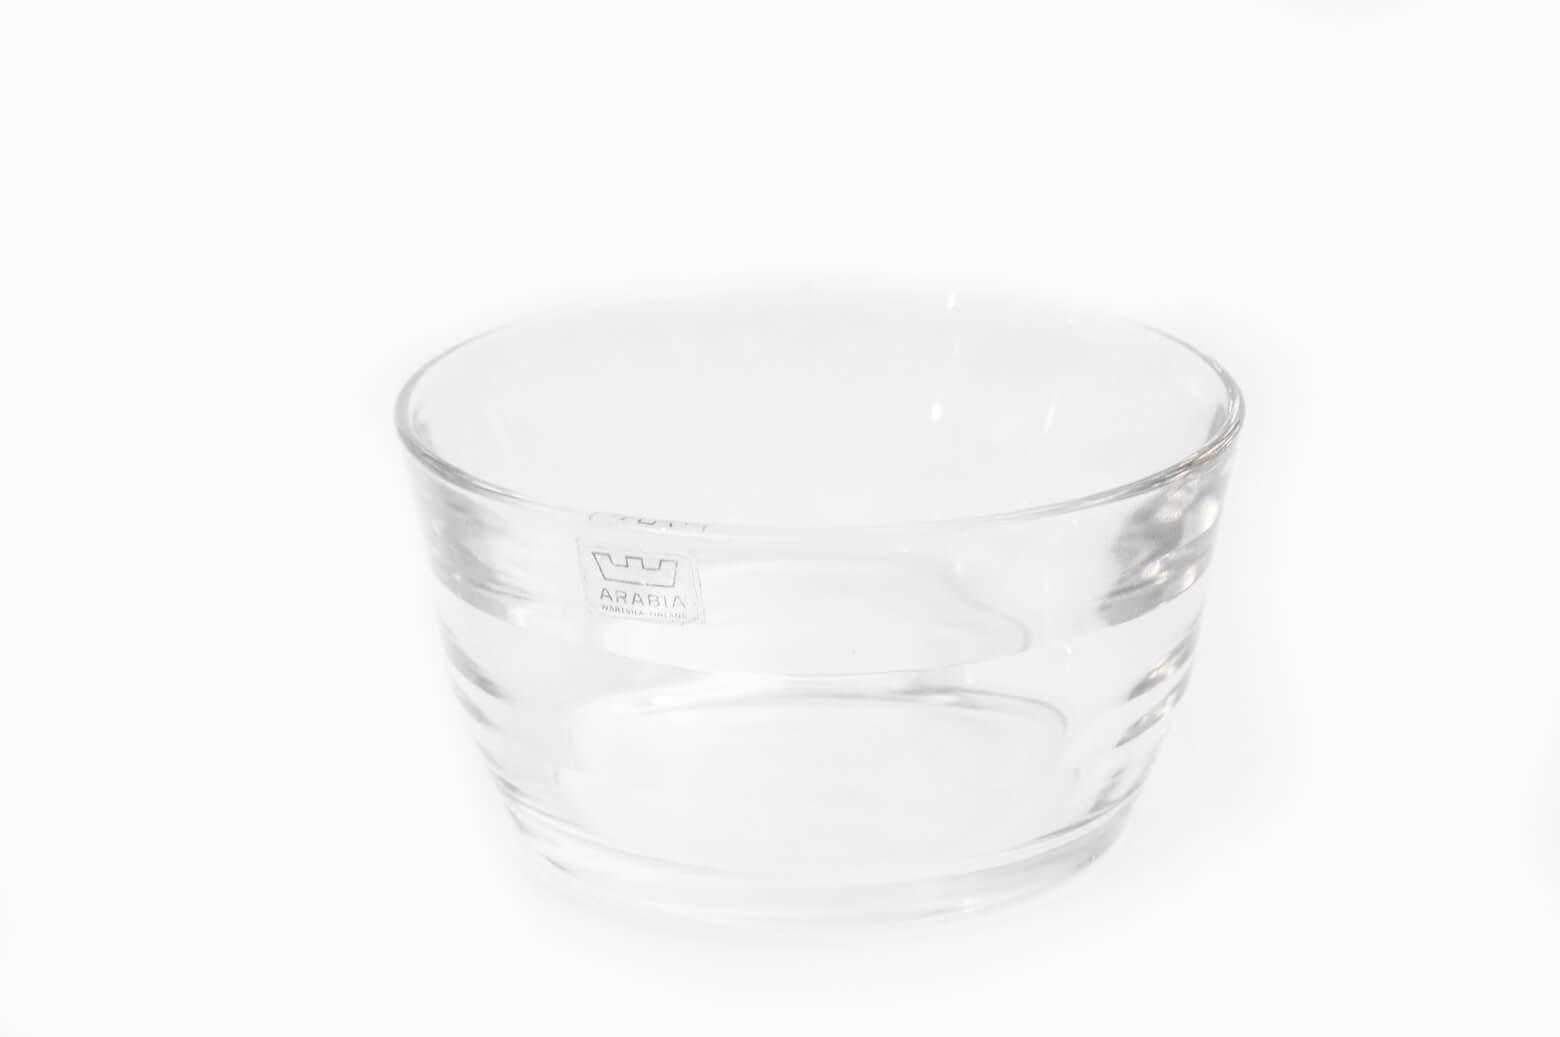 ARABIA Bowl PRISMA Kaj Franck/アラビア ボウル プリズマ カイ・フランク グラス ヴィンテージ 北欧食器 2